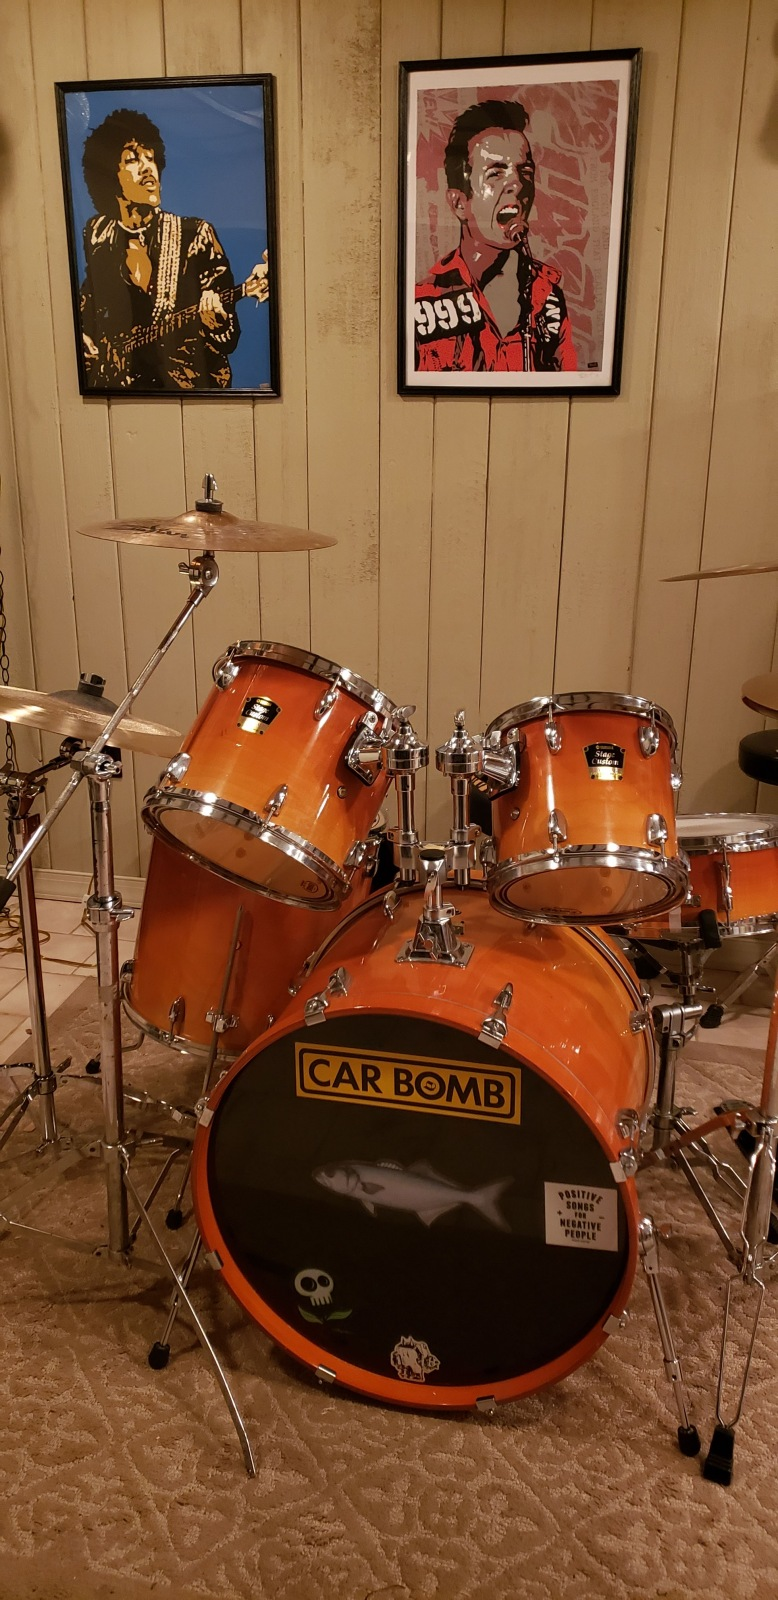 Drums.jpg.e0930b5d0606ab970d64ebbad49715ae.jpg